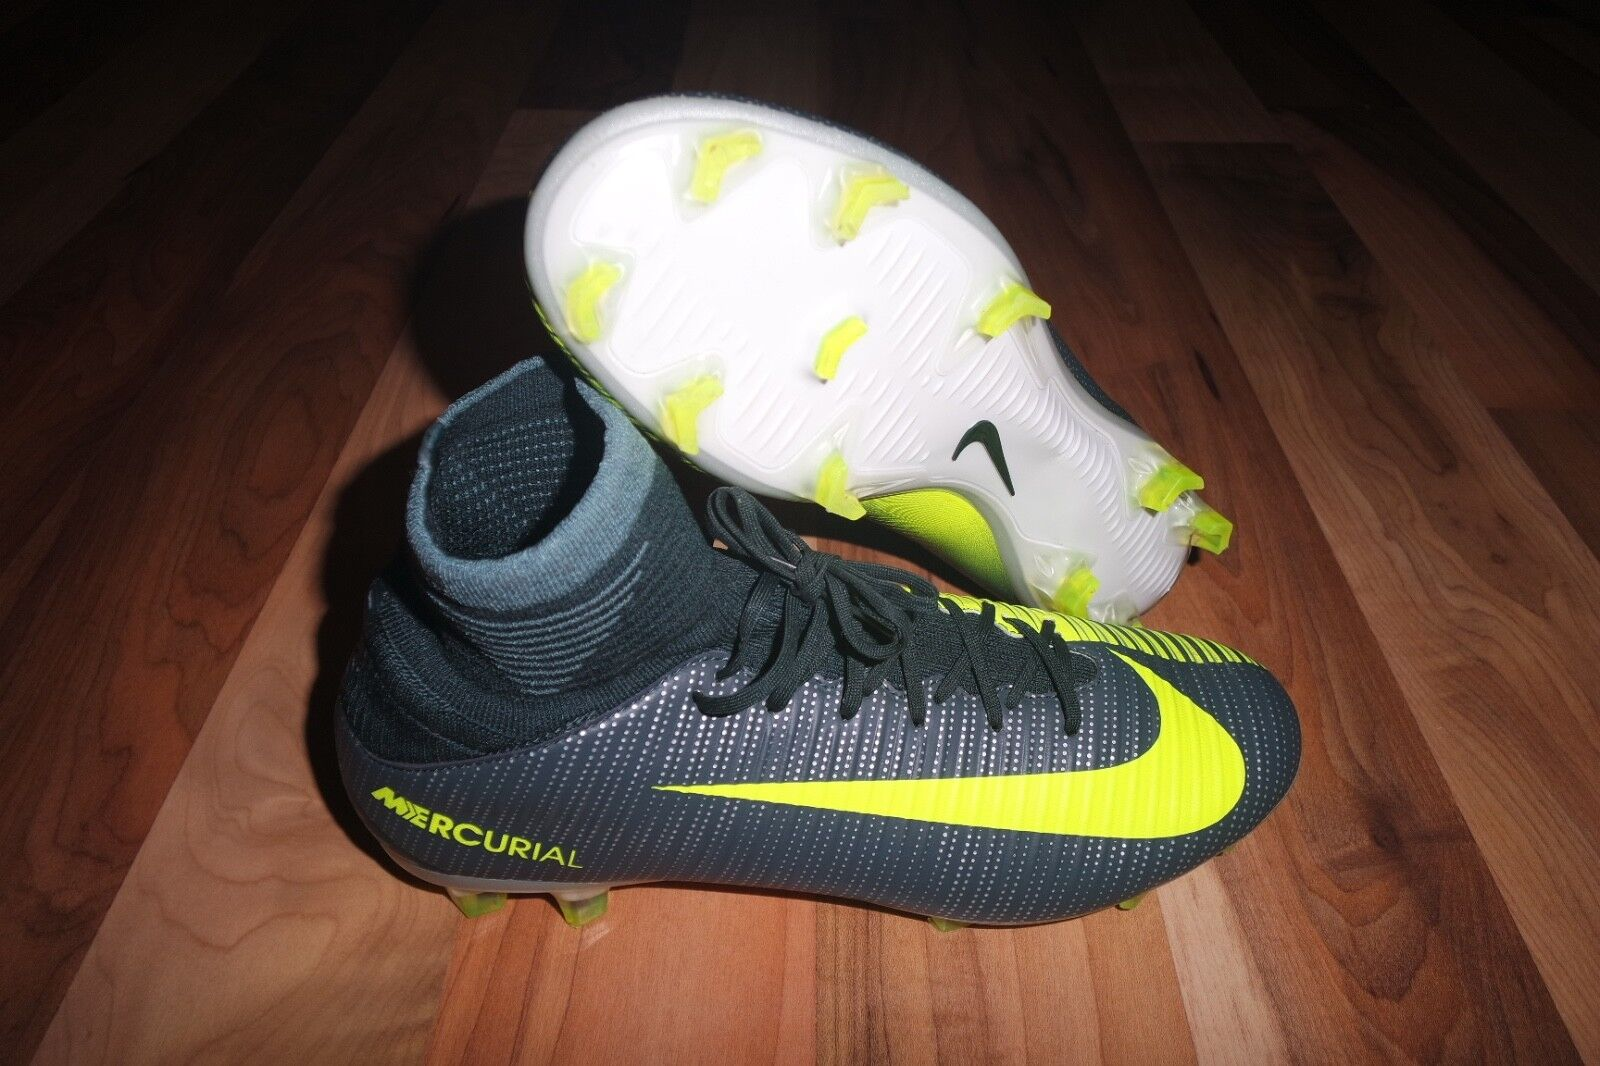 Nike Mercurial Veloce III 3 DF CR7 FG Botines de fútbol 852518 376 US 6 EU 38.5  180